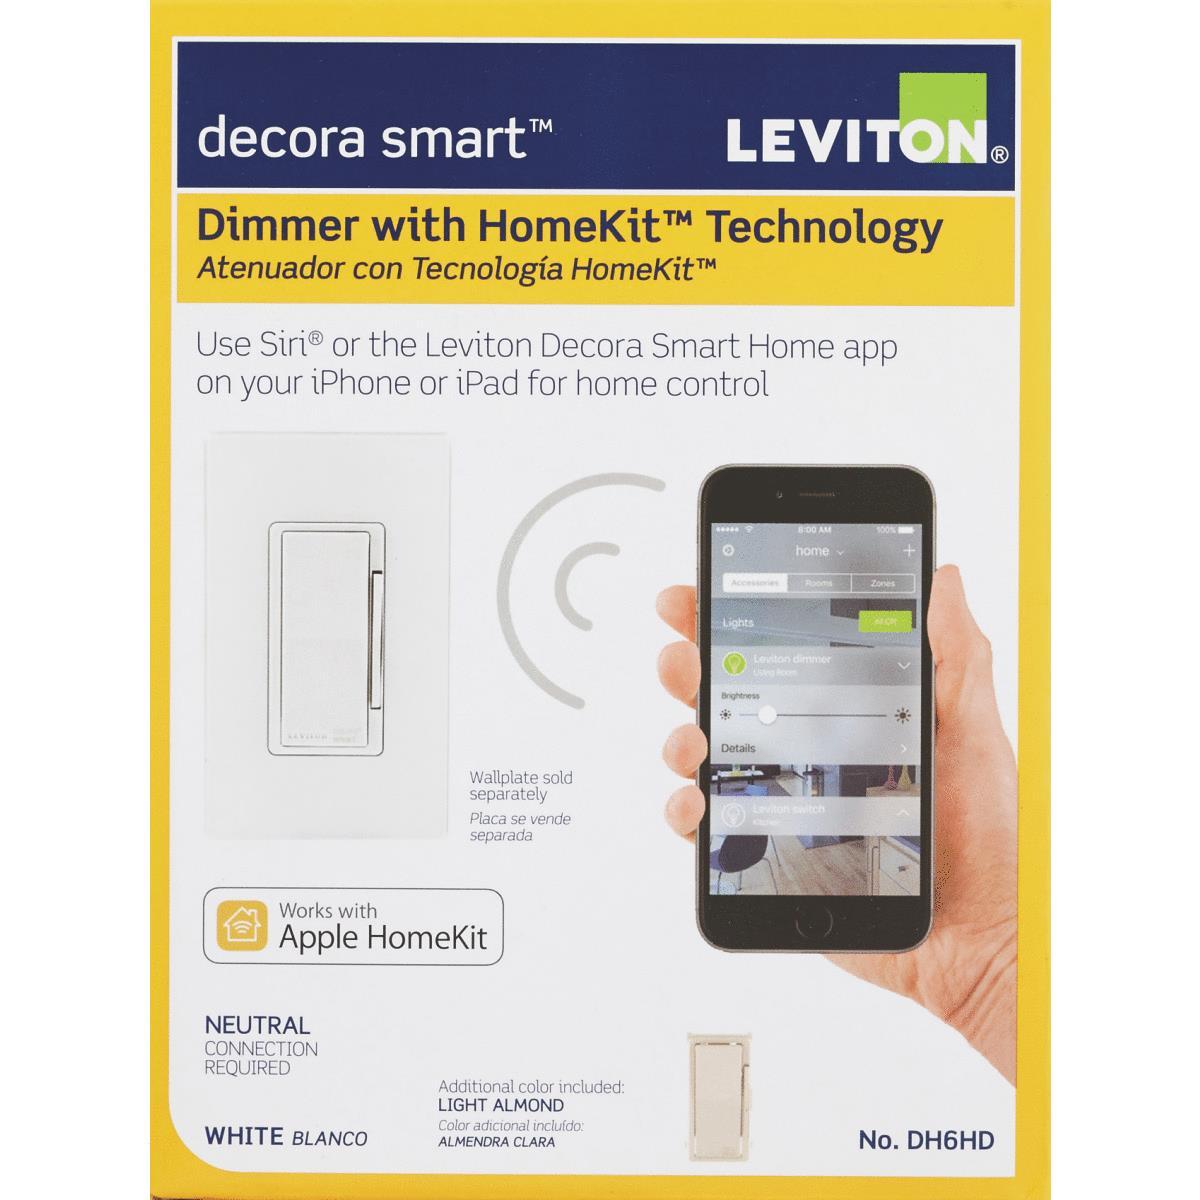 Buy Leviton Decora Smart Rocker Dimmer Switch With HomeKit Technology